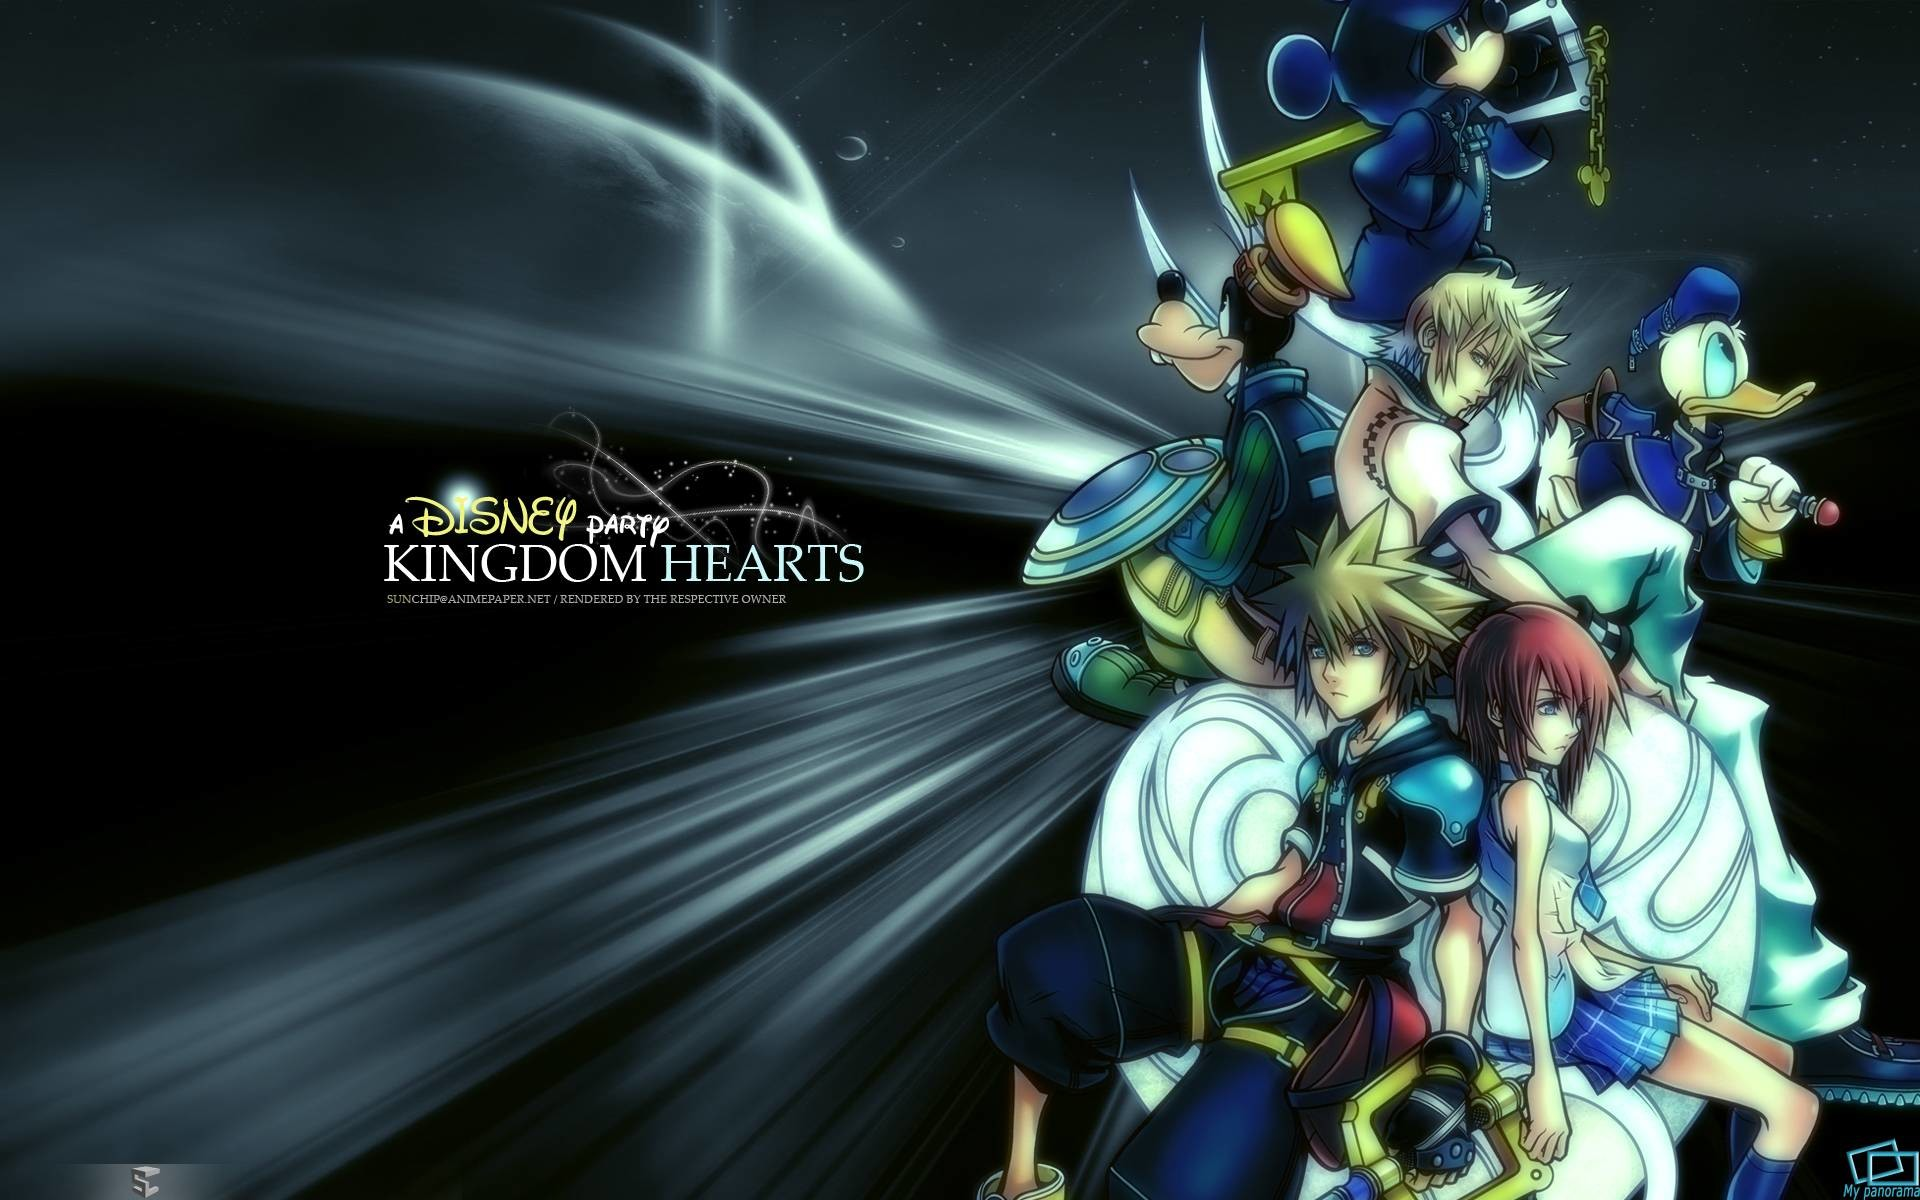 Kingdom Hearts 2 wallpapers | Kingdom Hearts 2 background – Page 14